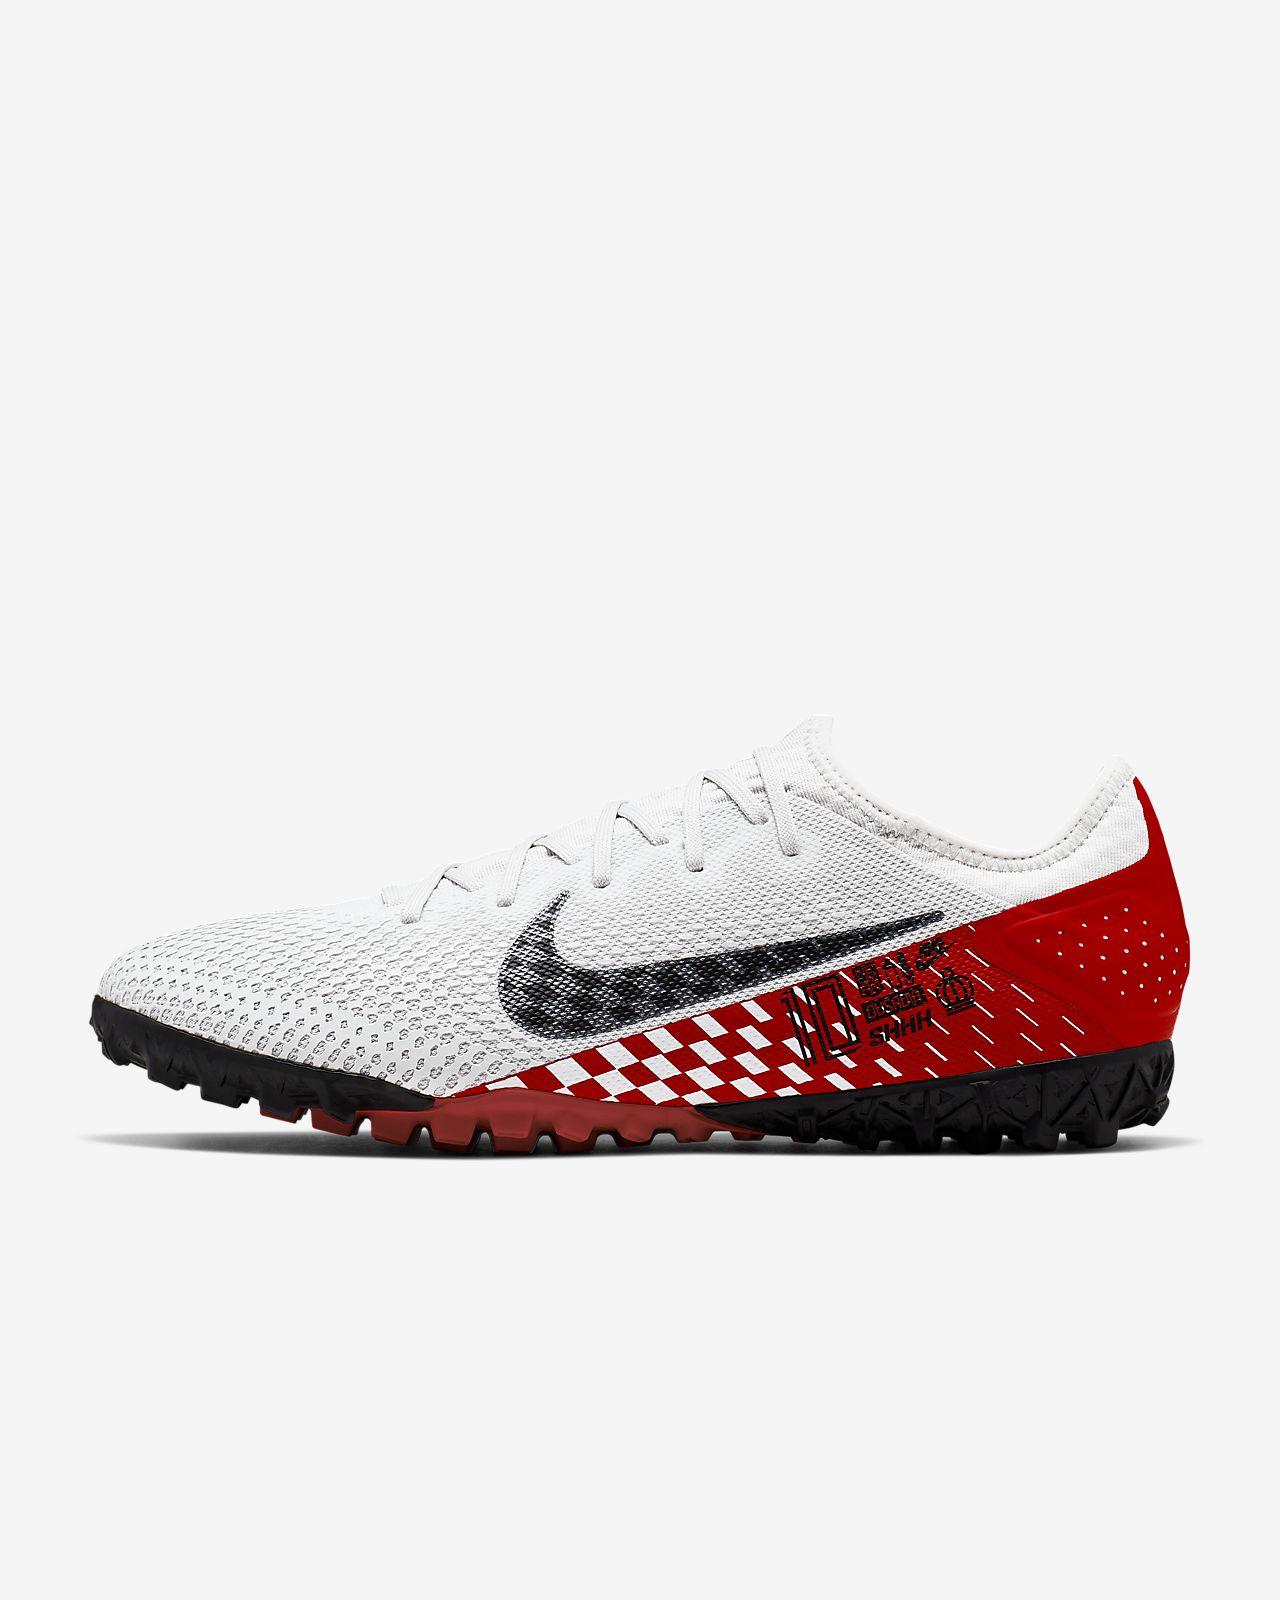 Nike Mercurial Vapor 13 Pro Neymar Jr. TF Artificial-Turf Football Shoe